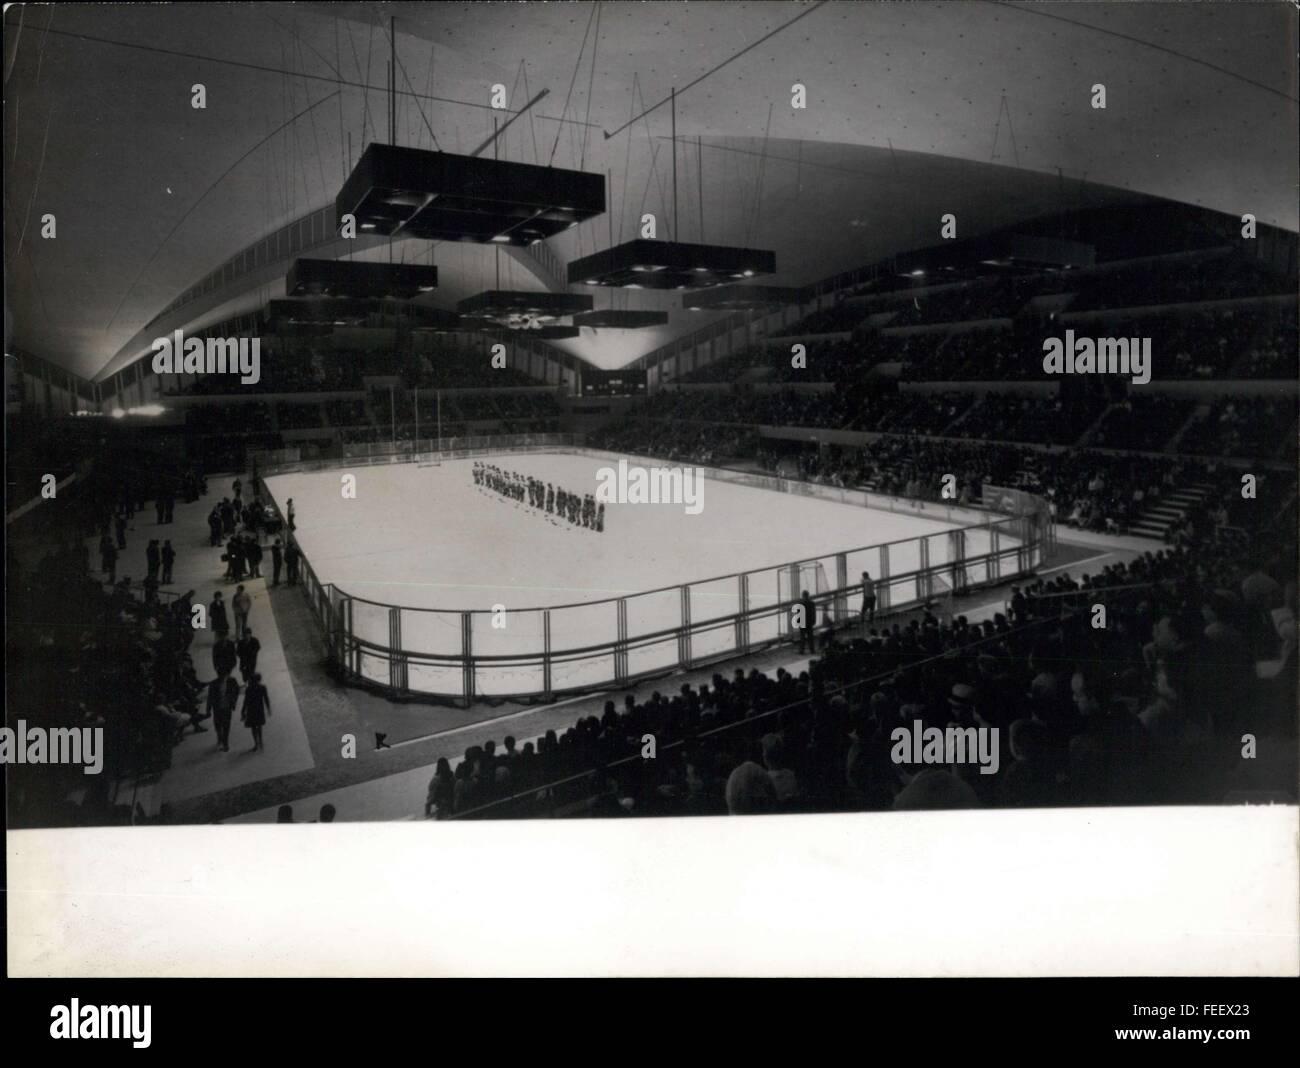 1967 - Grenoble - Gigantic interior of the ice stadium, during the international weeks of November 1967. NPM: La - Stock Image